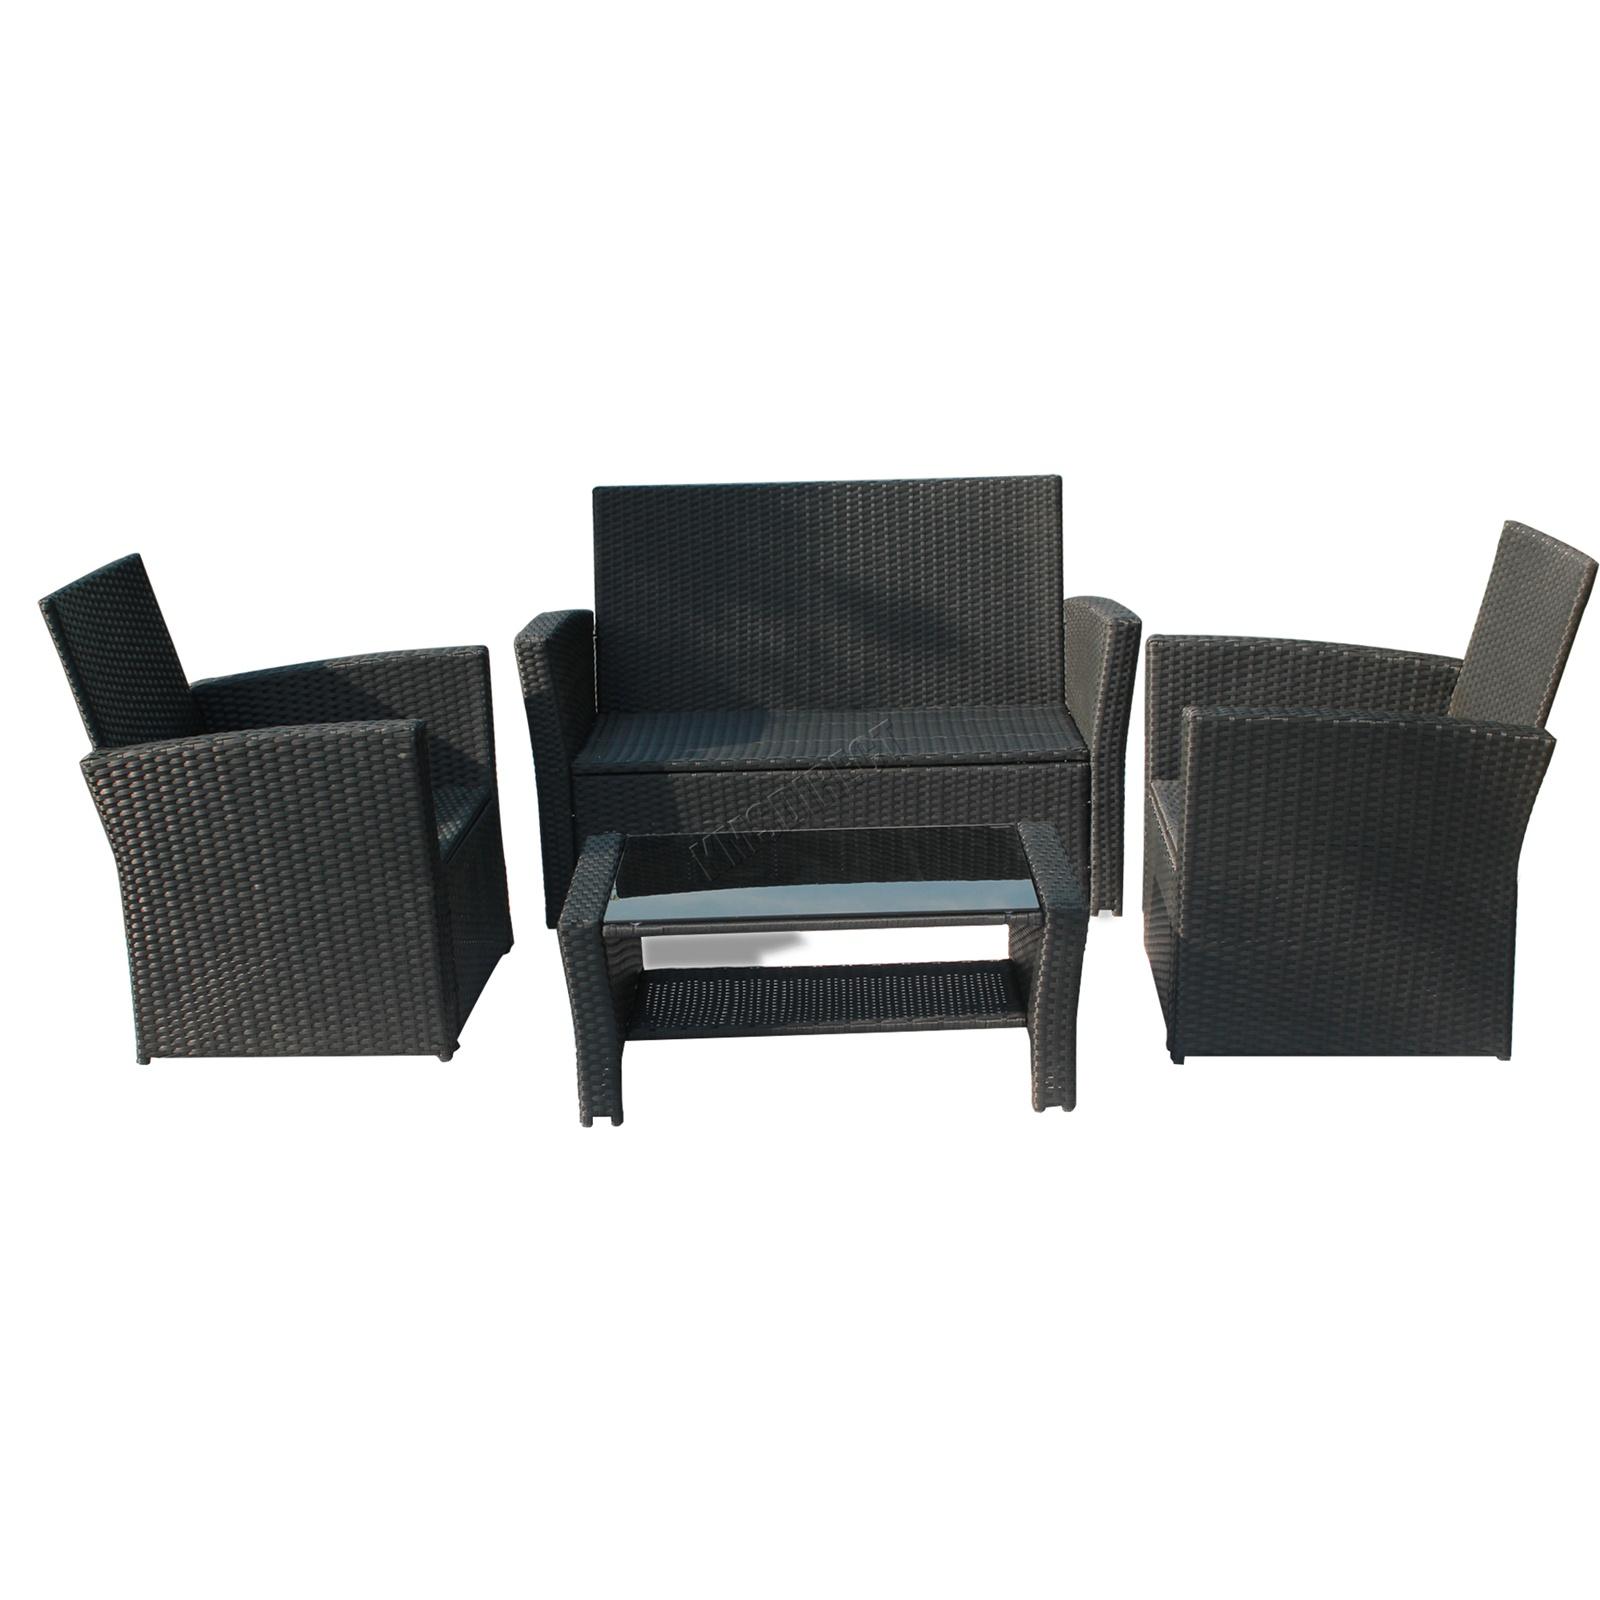 BIRCHTREE Rattan Garden Furniture Set Armchair Sofa Glass ...